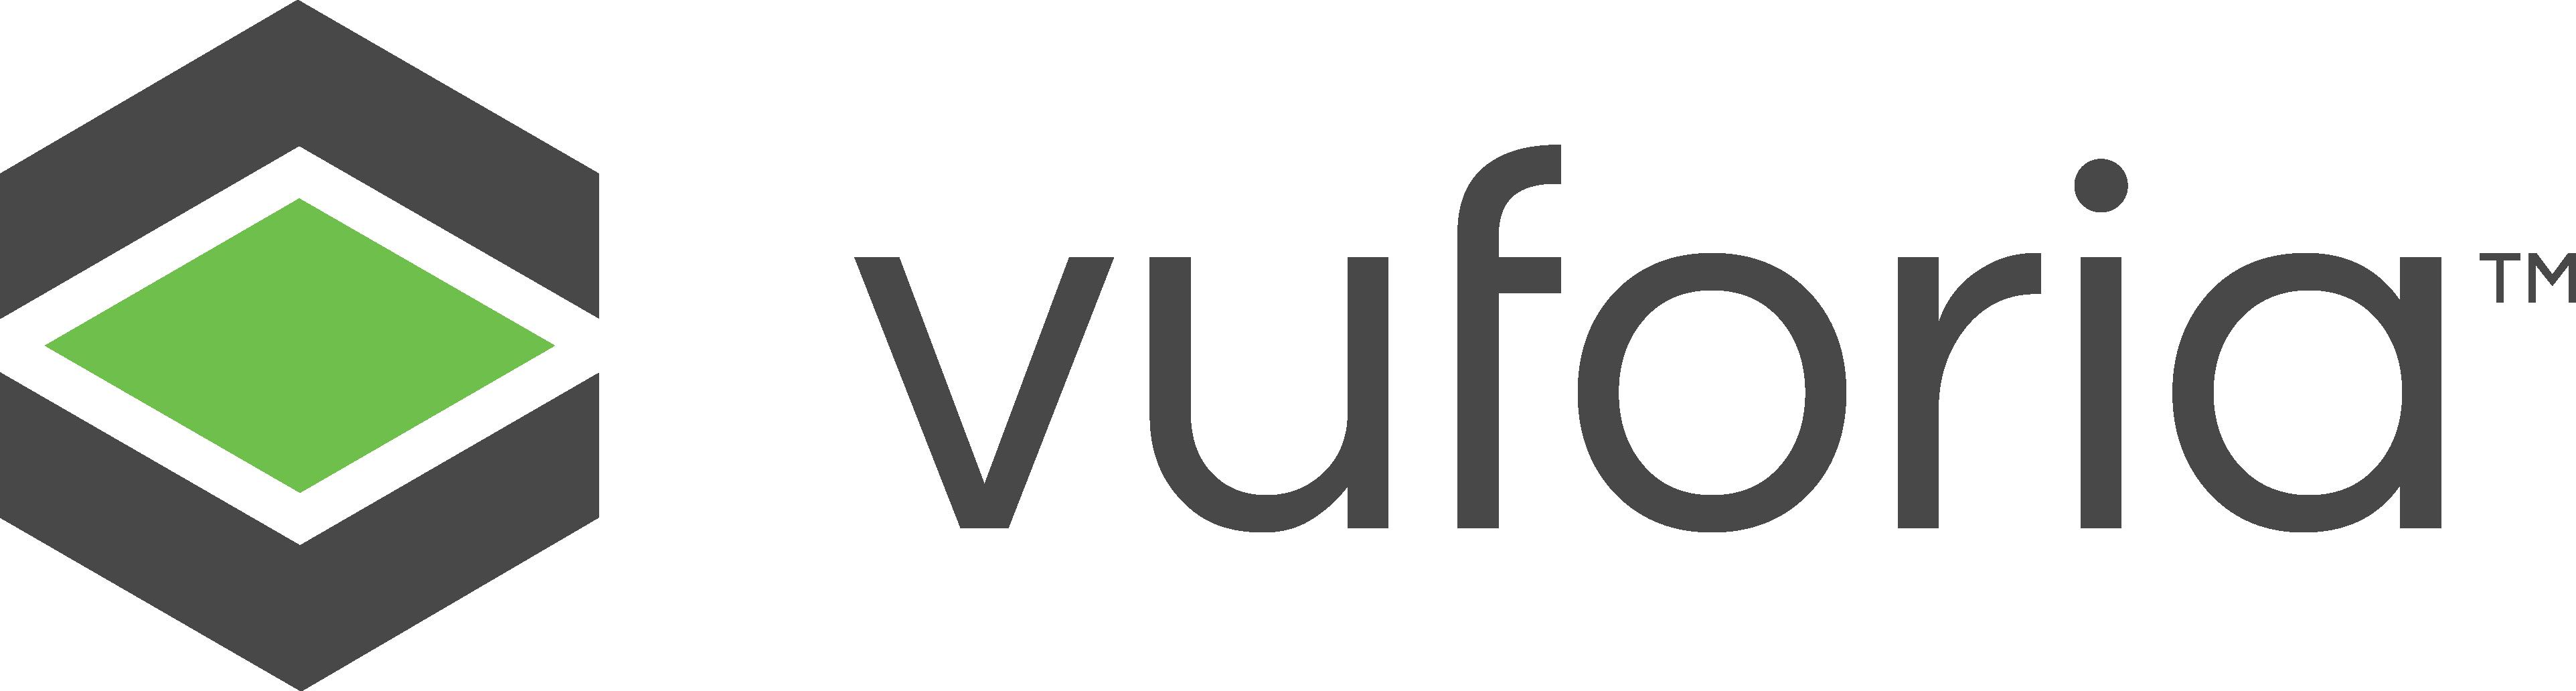 Augmented Reality Vuforia PTC